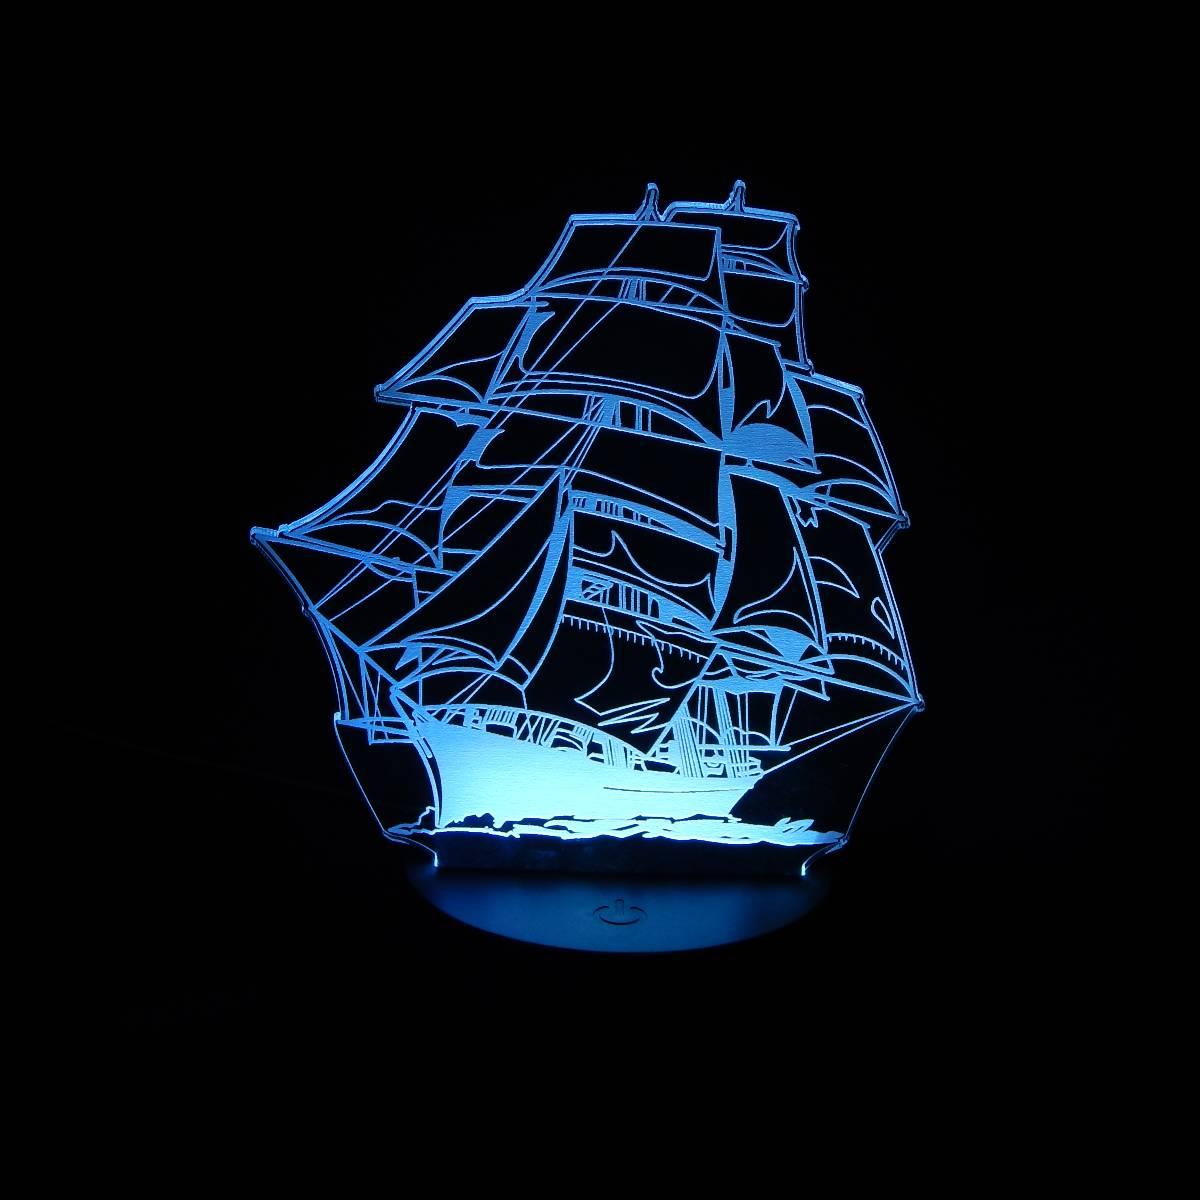 Lampu Meja Lampu Tidur Lampu Hias Kapal LED 3D Tradisional4